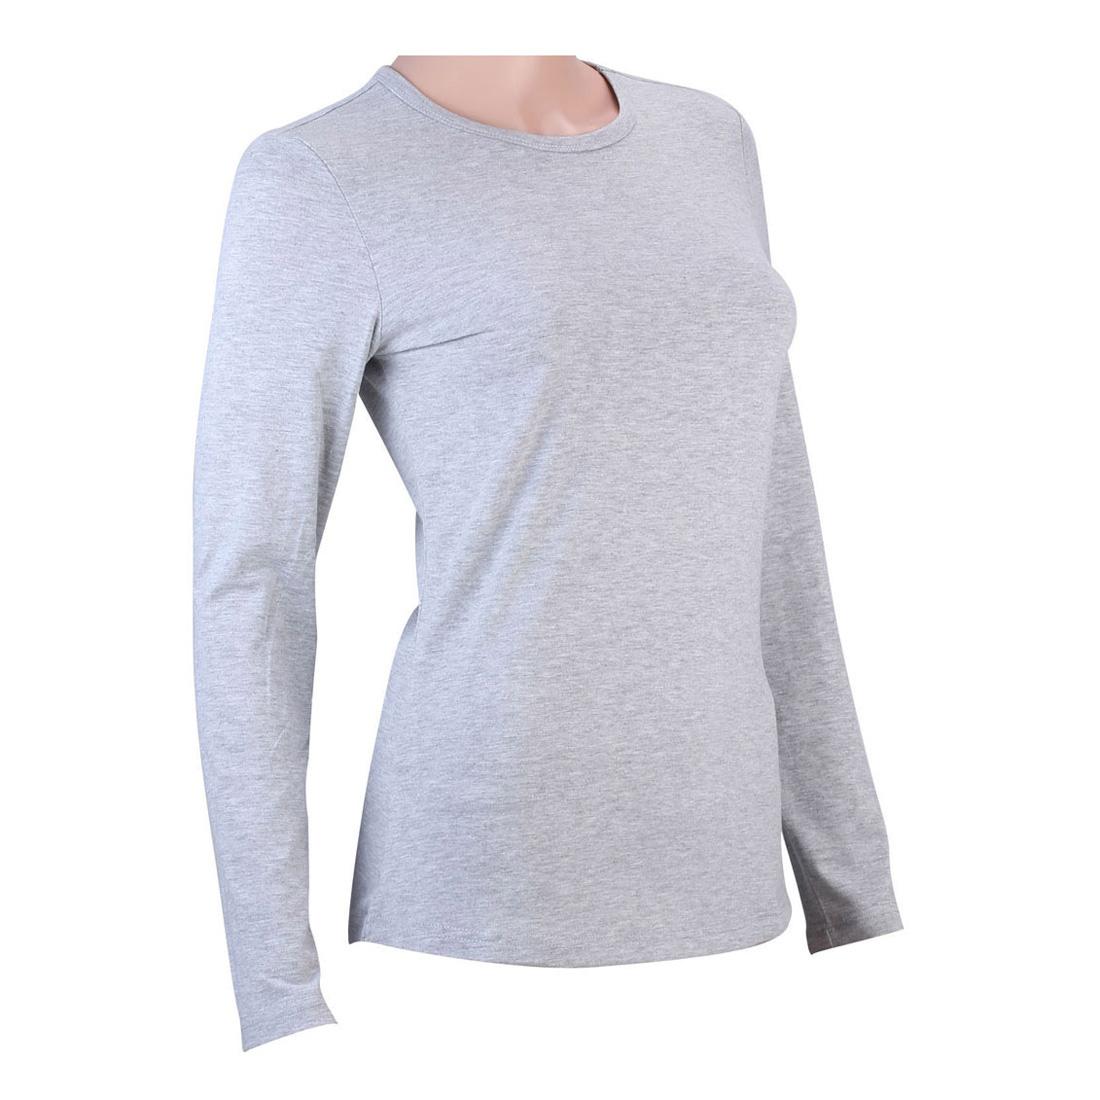 100 cotton womens v neck crew neck long sleeve t shirt for Basic shirts for women